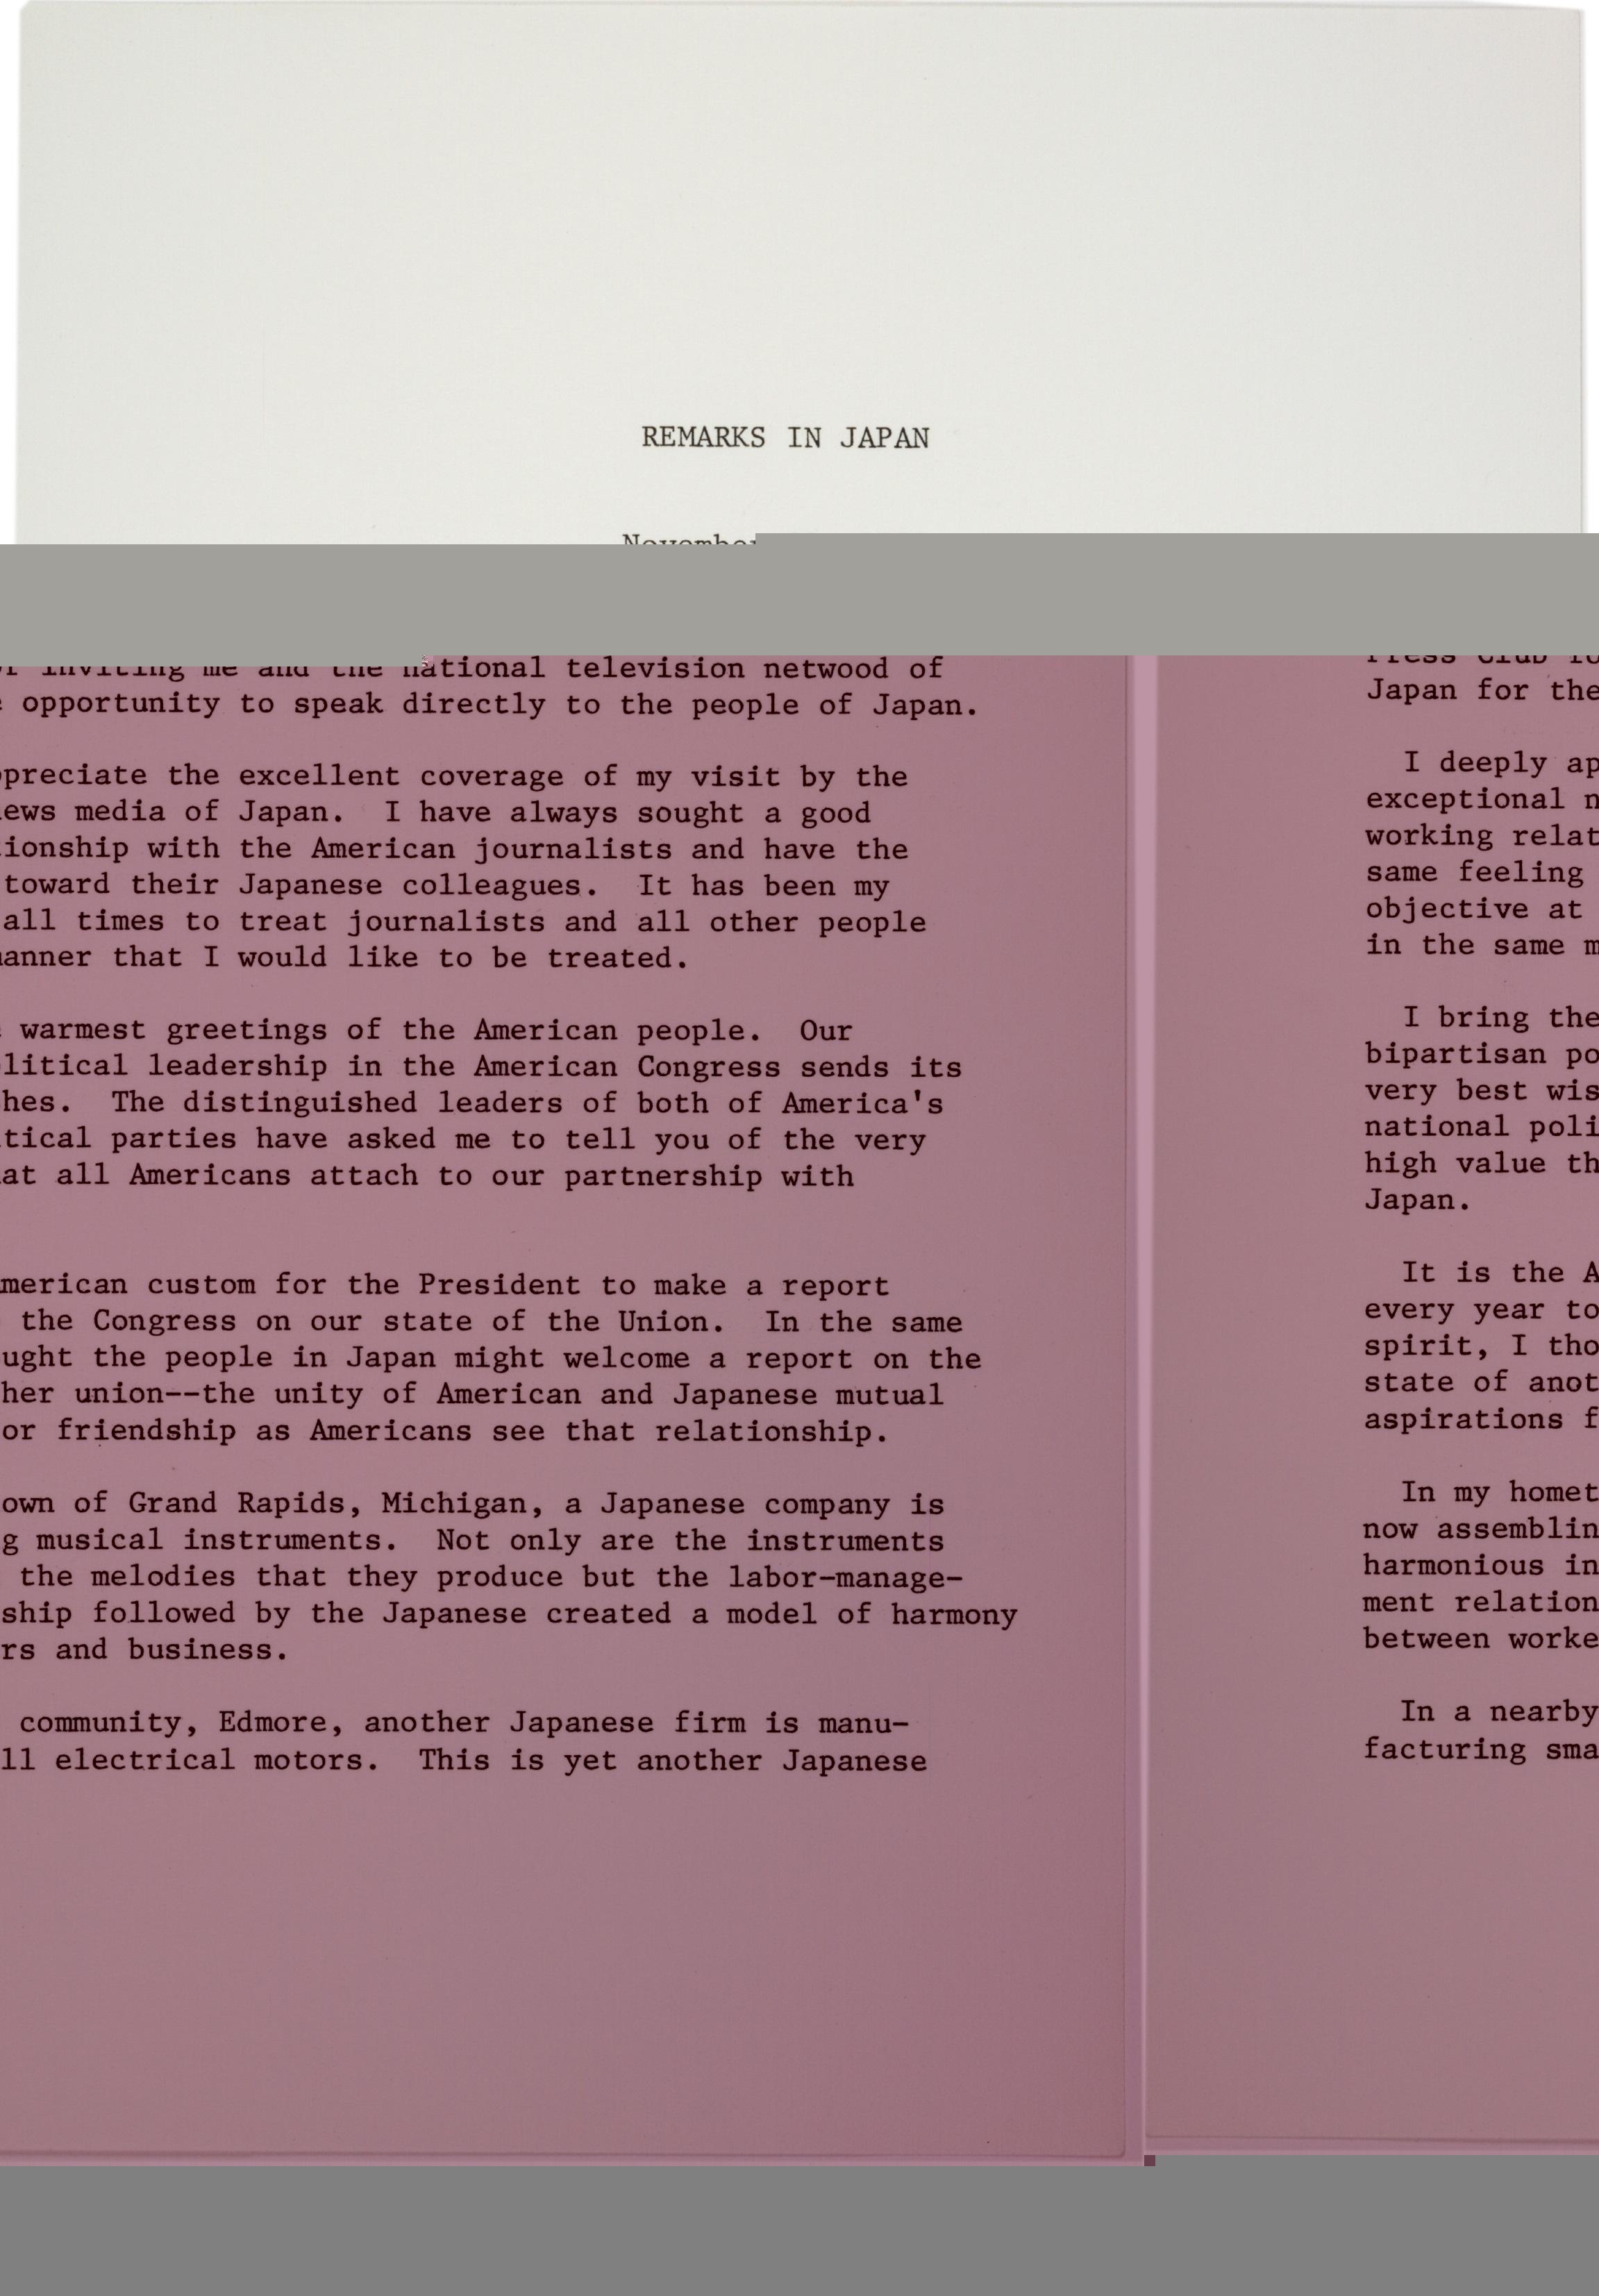 Gerald Ford's Remarks in Japan, November 20, 1974 (Gilder Lehrman Collection)